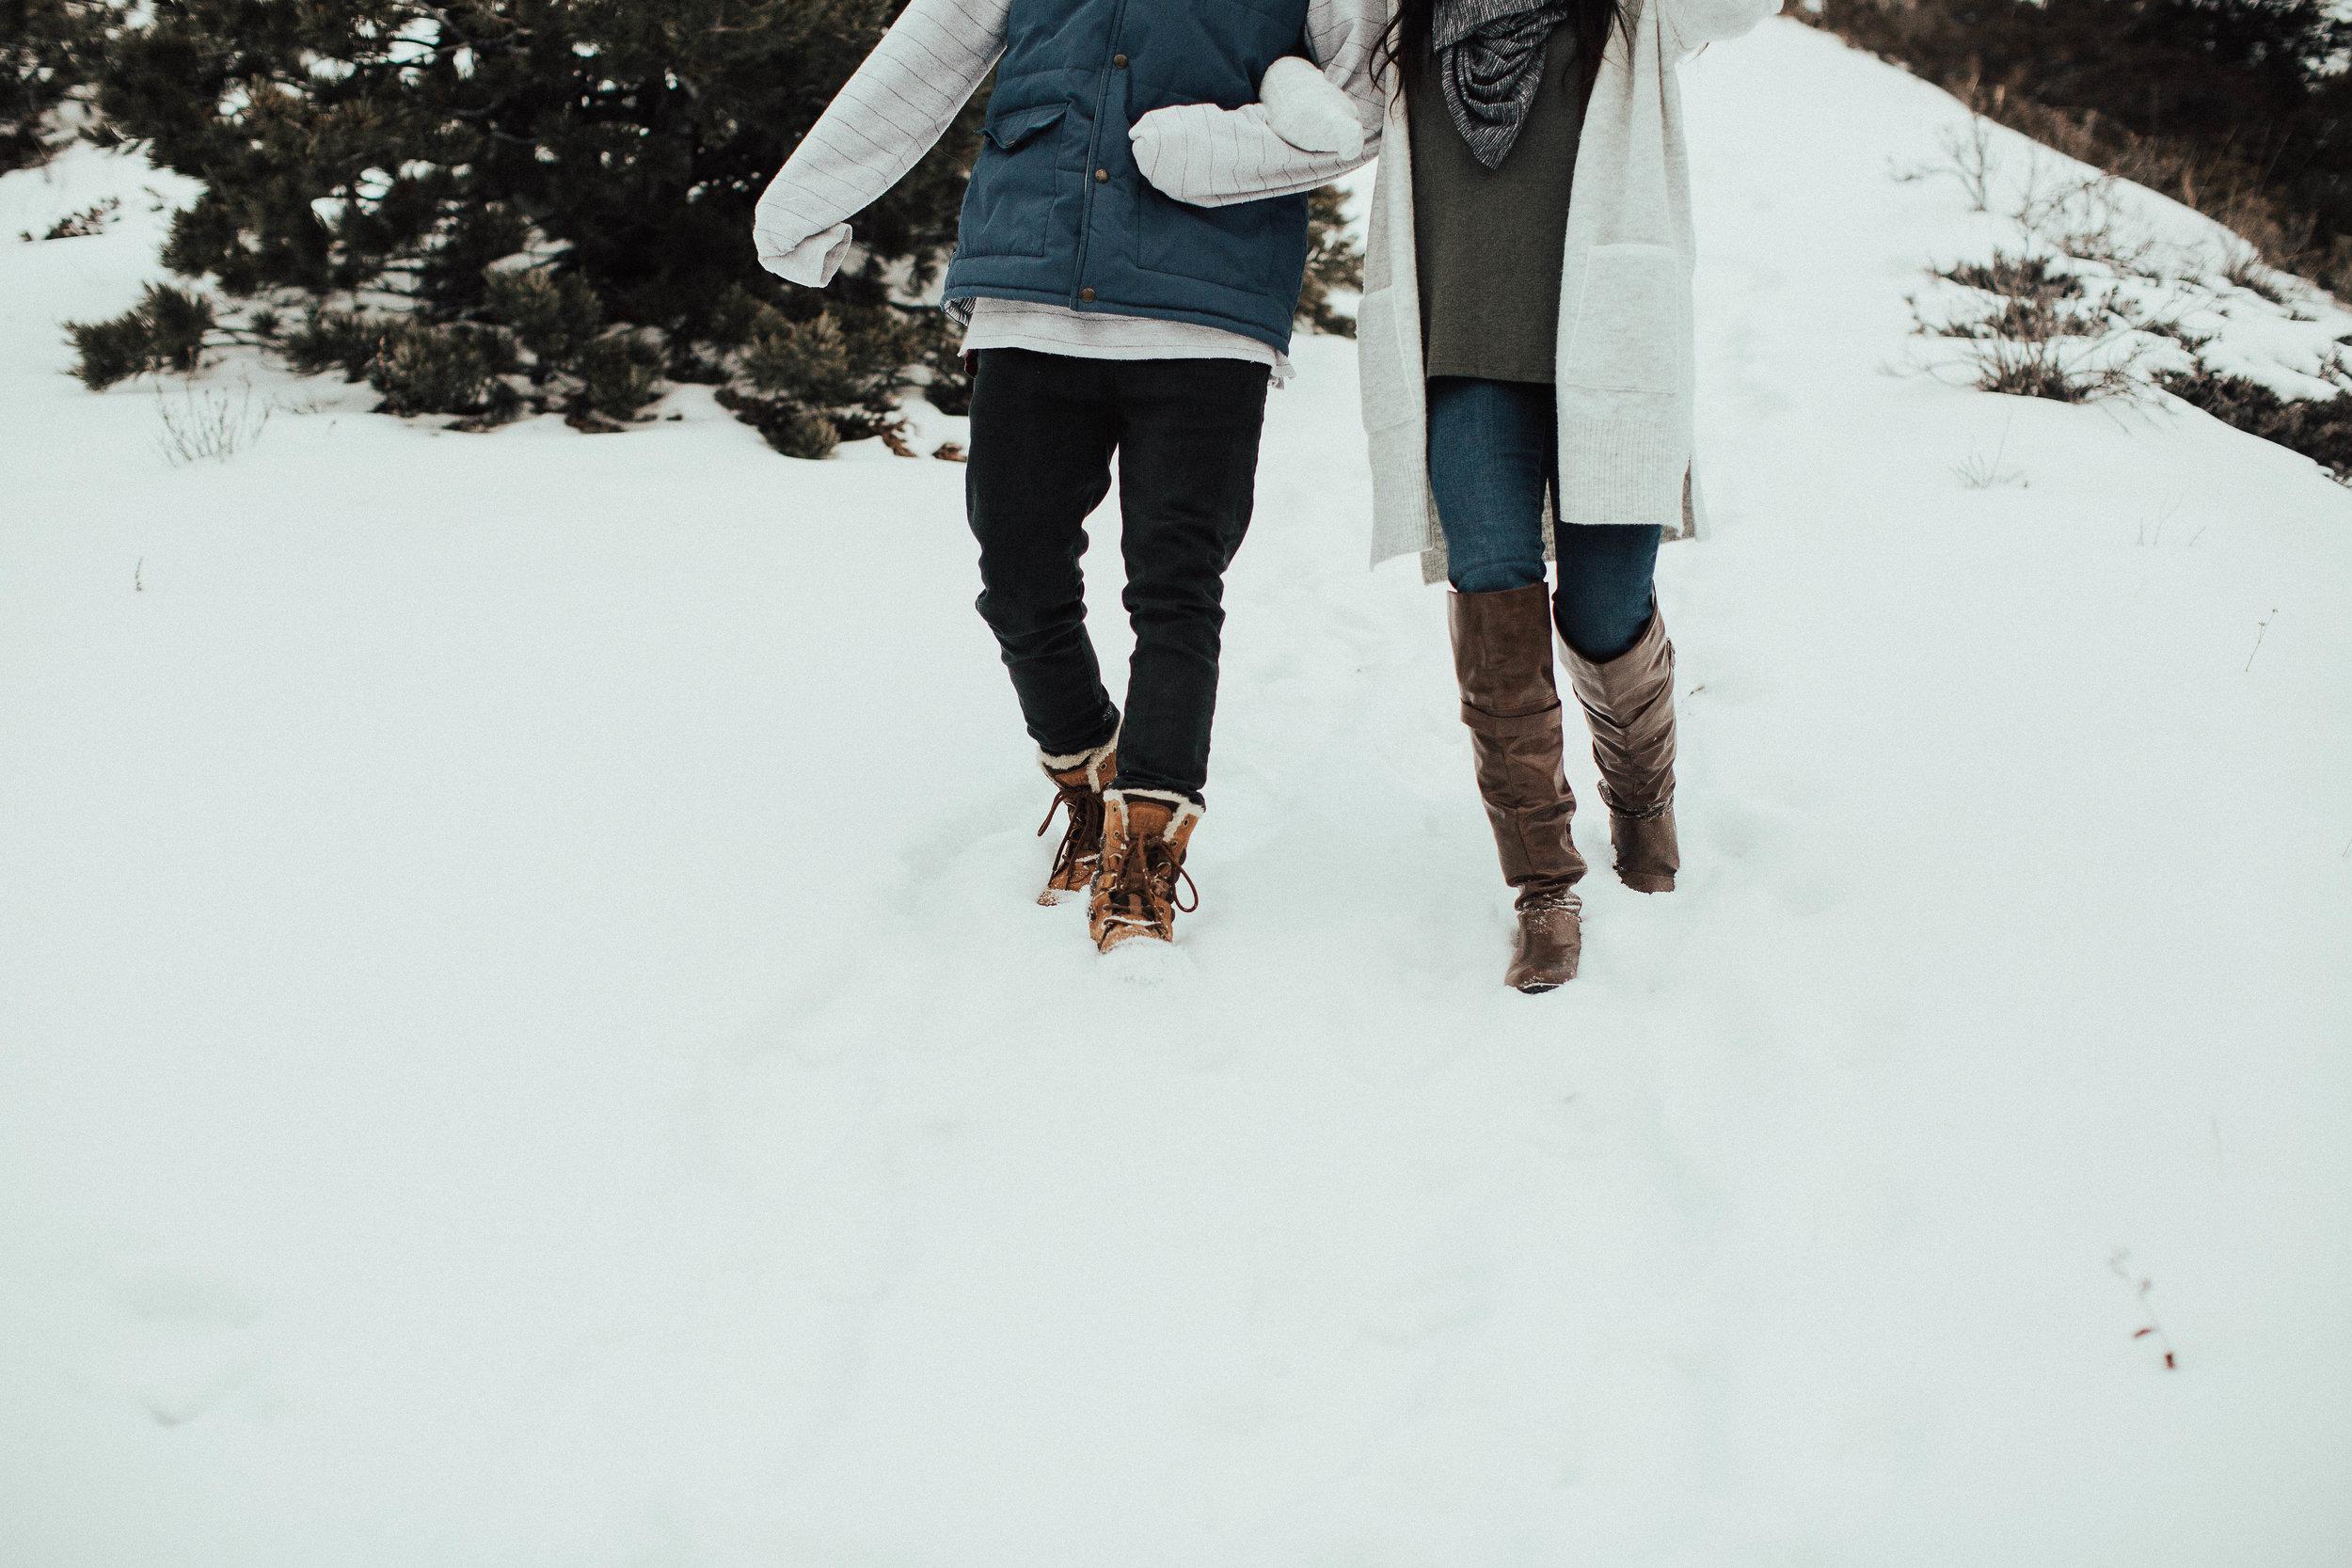 Banff Engagement Photographer - Winter Mountain Adventure Engagement Session - Michelle Larmand Photography-015